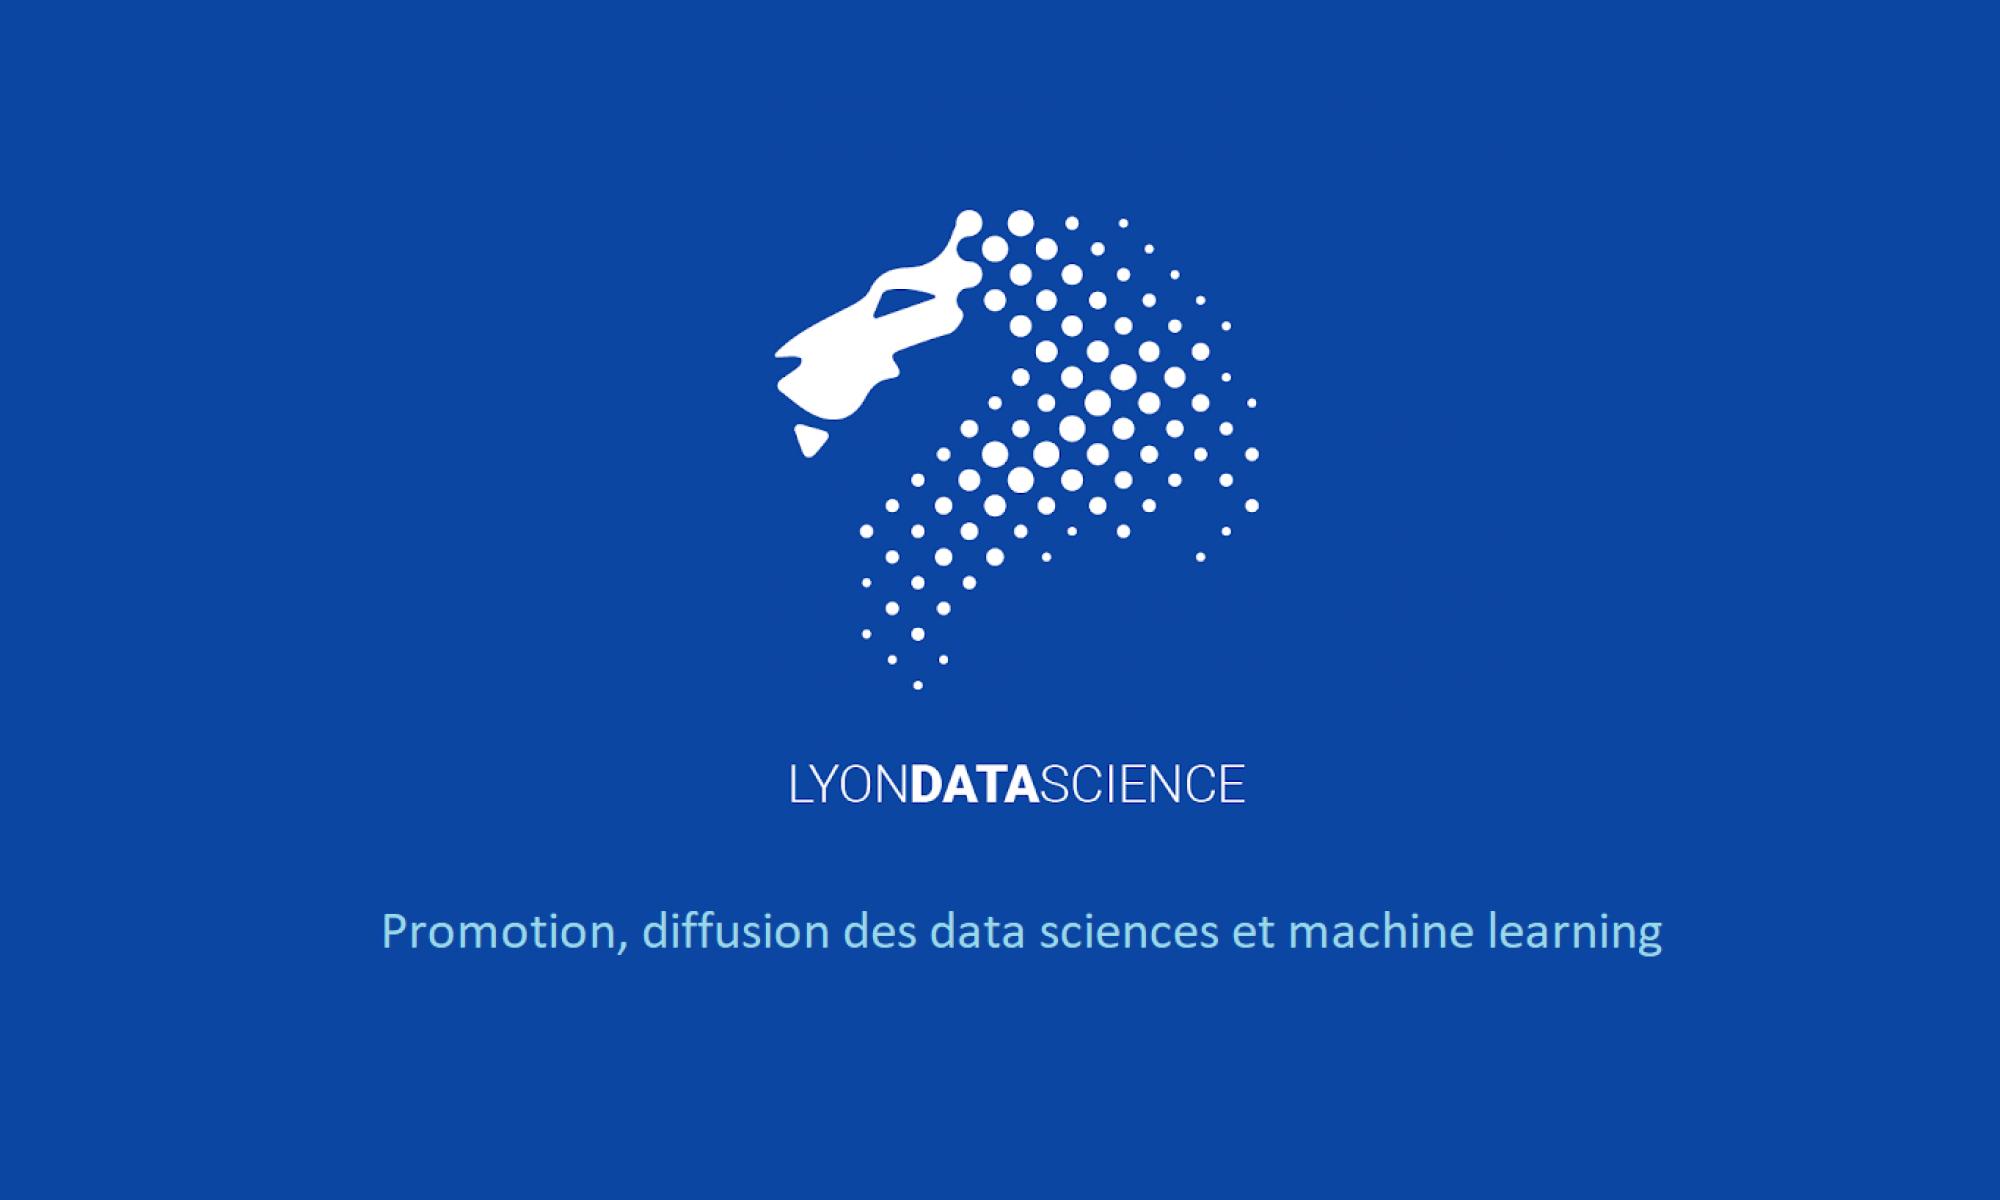 Lyon Data Science